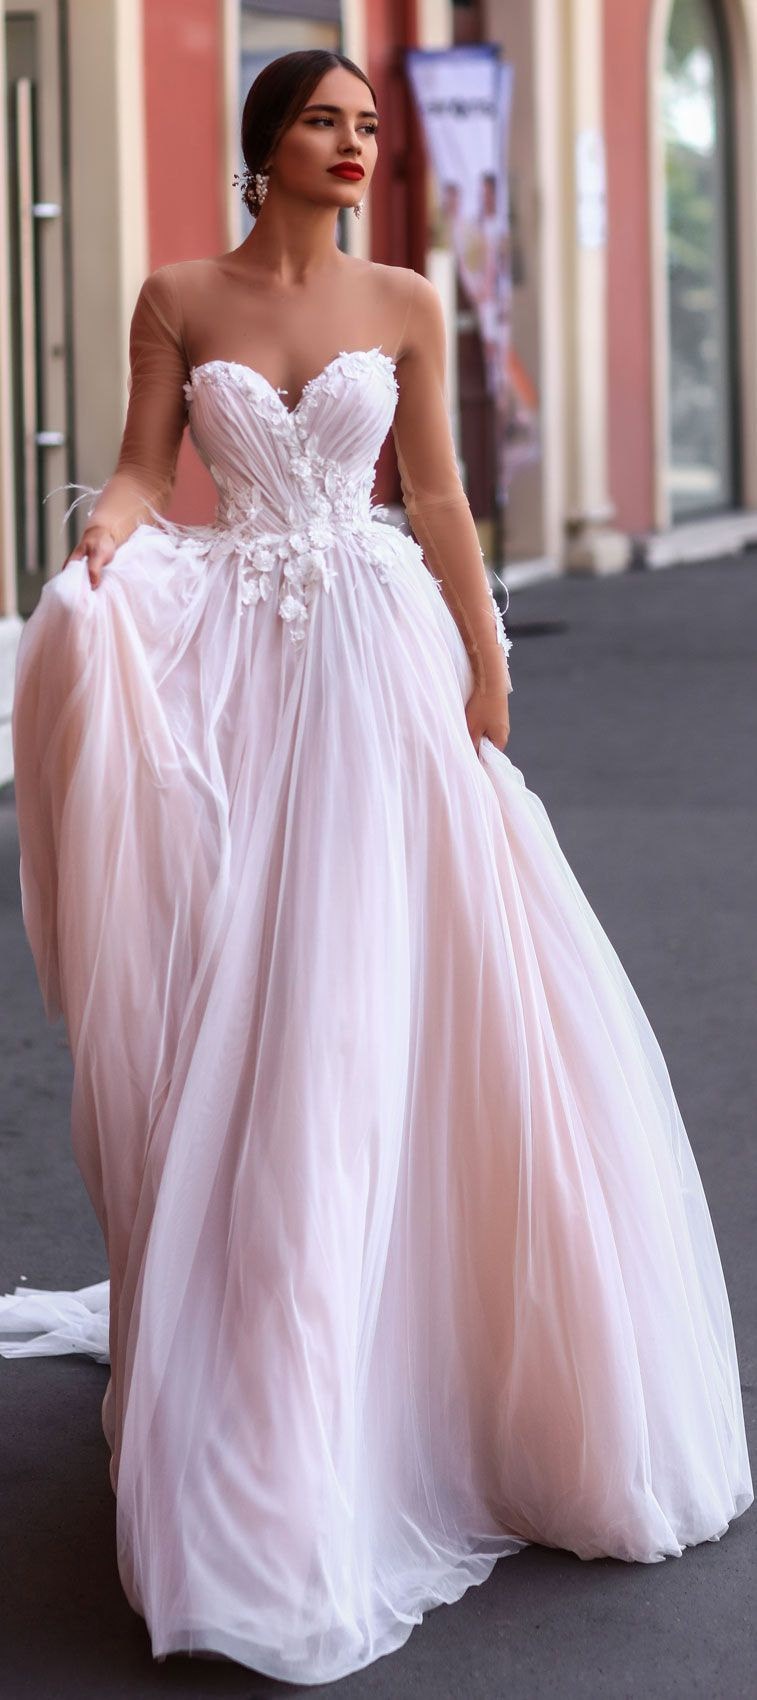 Katherine joyce wedding dresses illusion long sleeve sweetheart